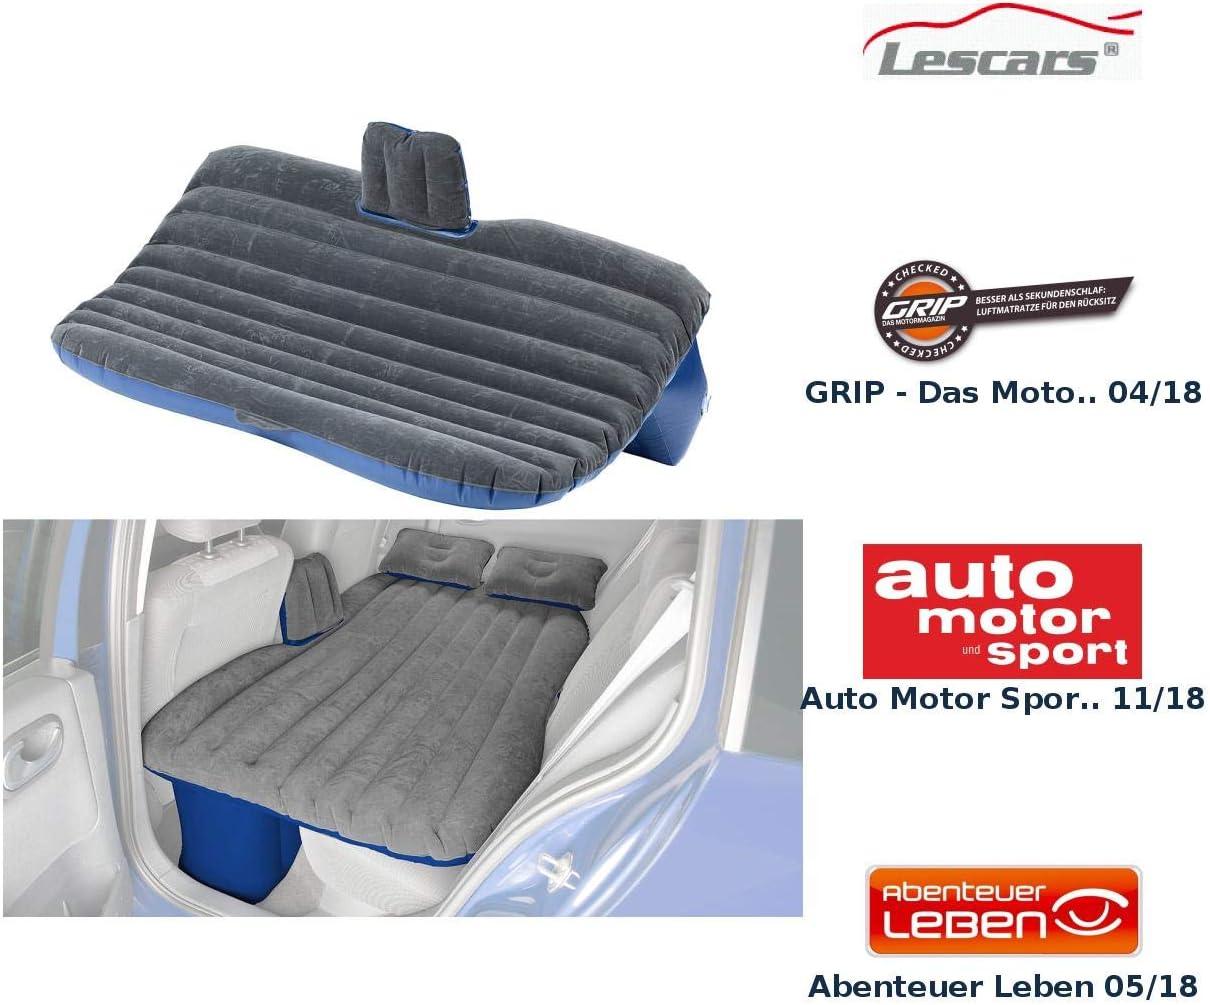 M-PENG 1 x ac auto klimaanlage r134a k/ältemittel ladeschlauch h25b1414ff 1 4sae